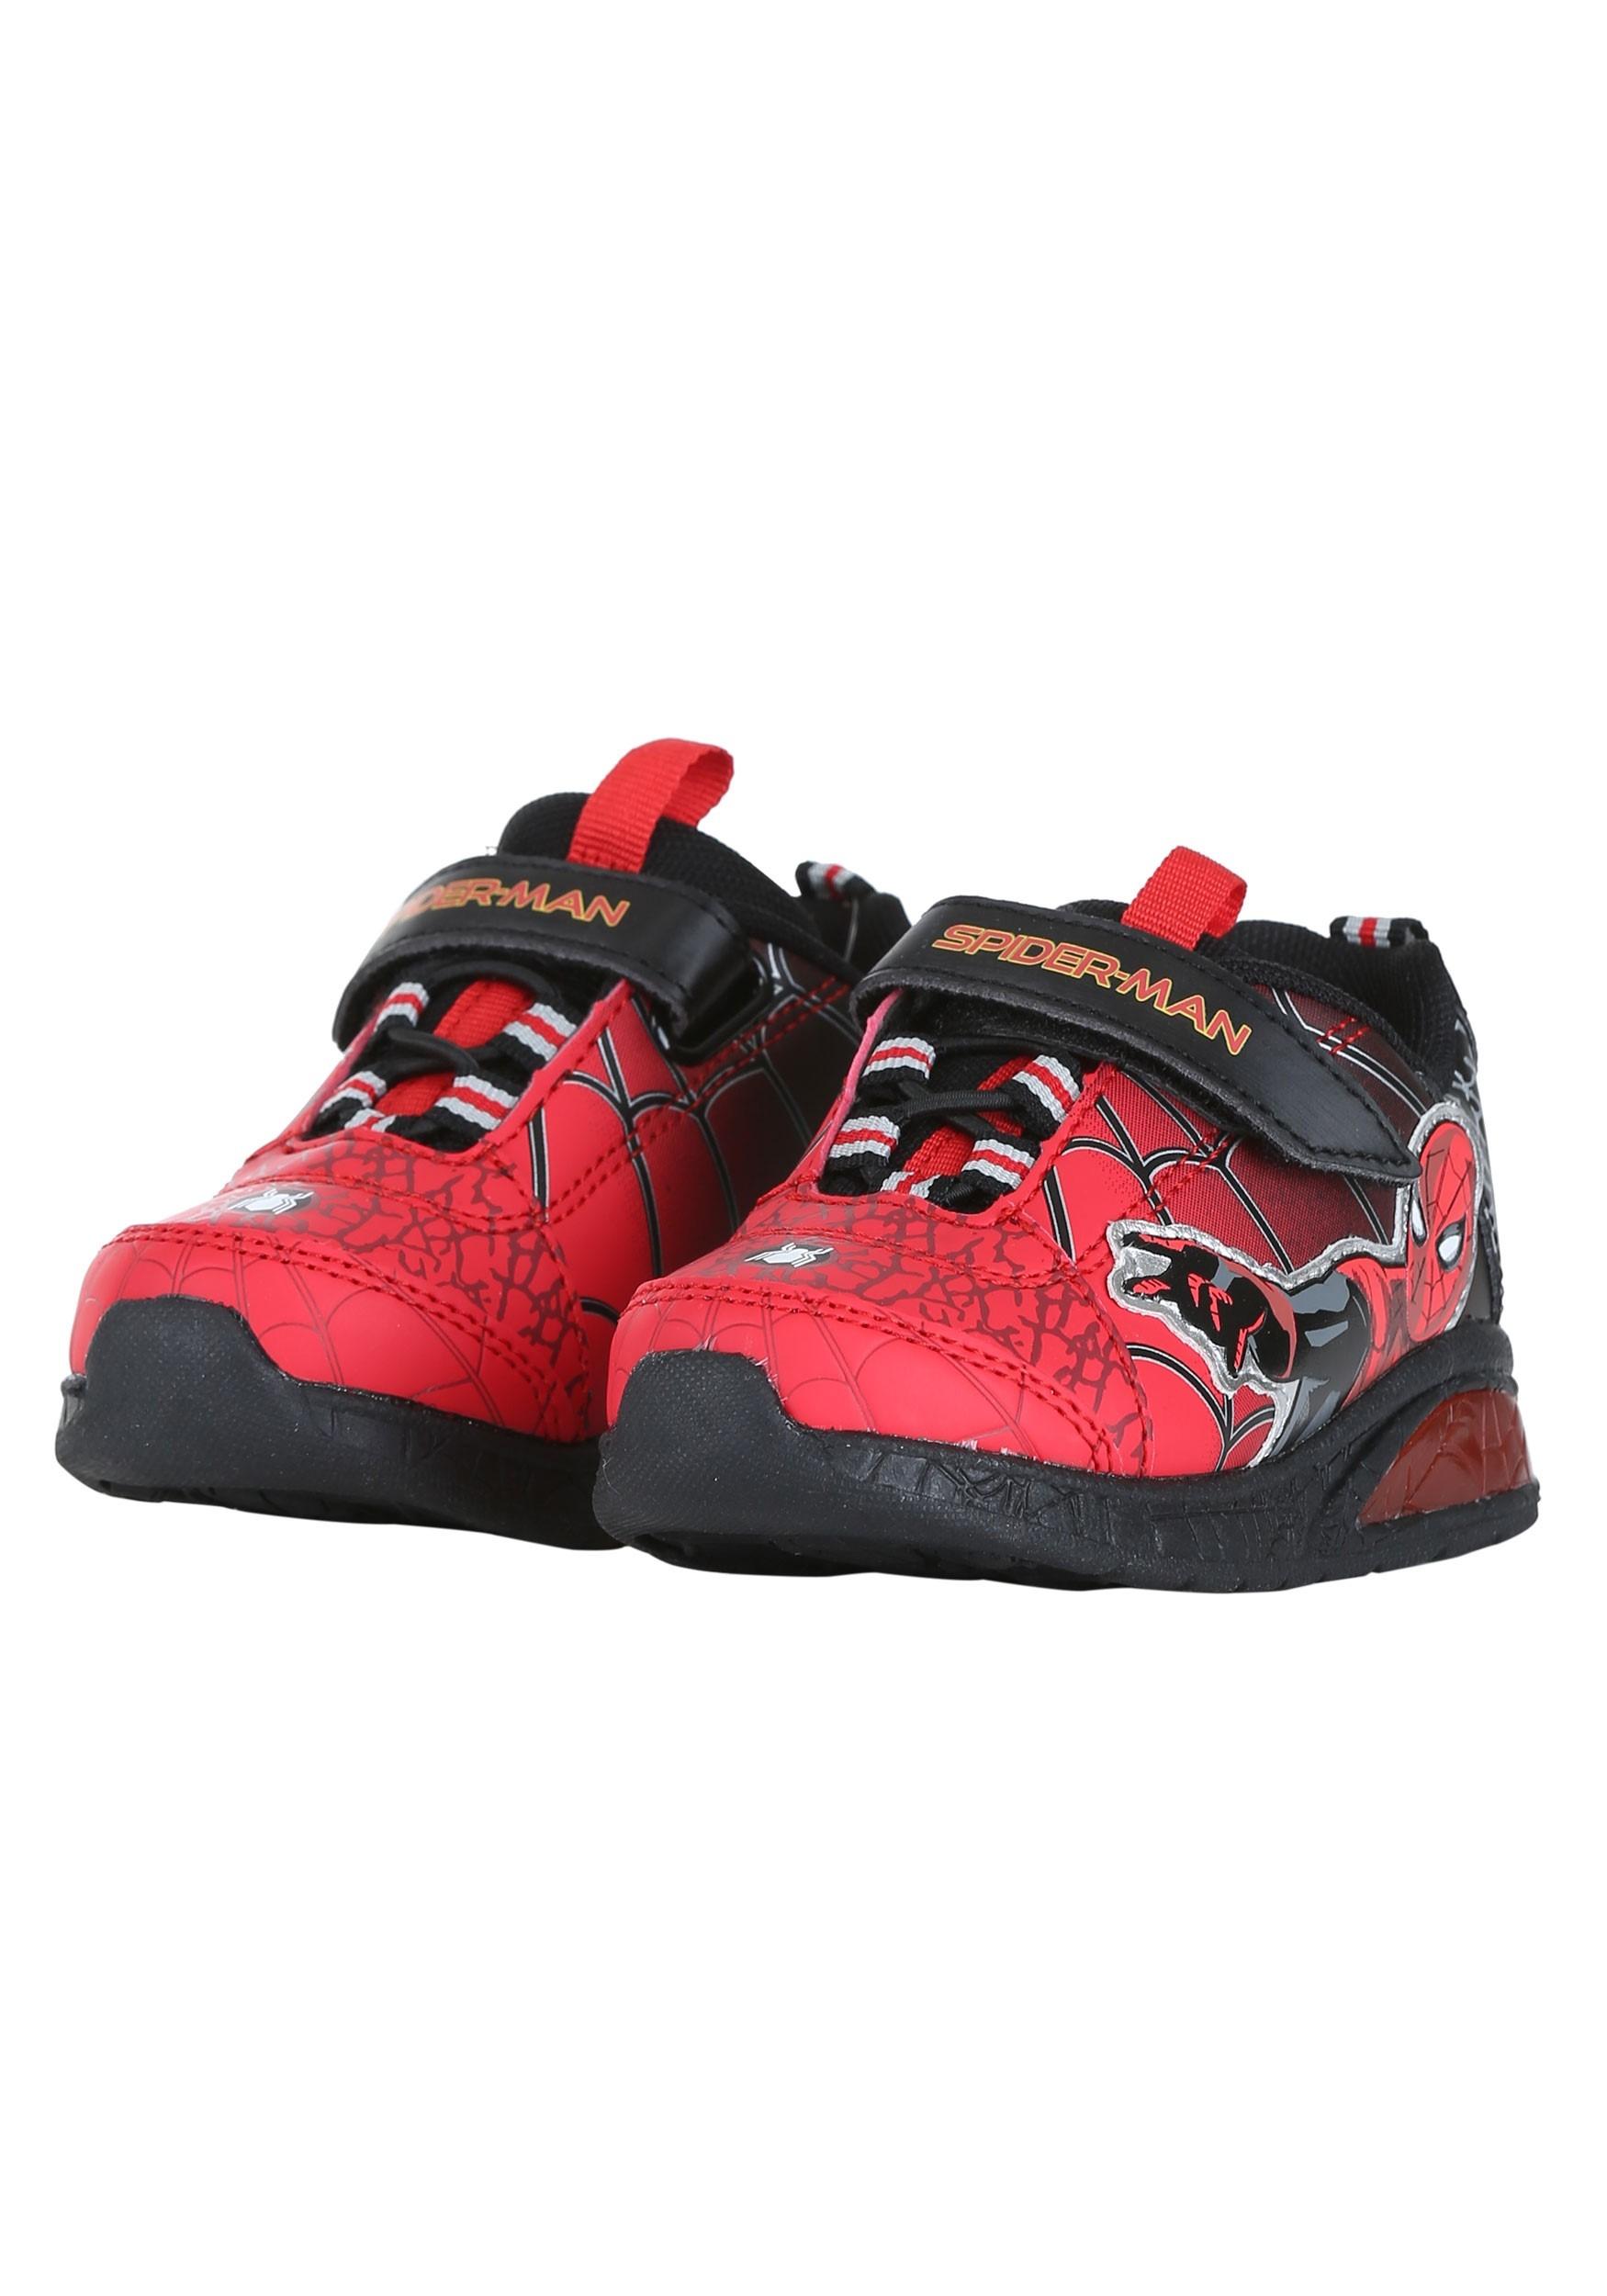 Spider-Man Lighted Athletic Shoe for Kids